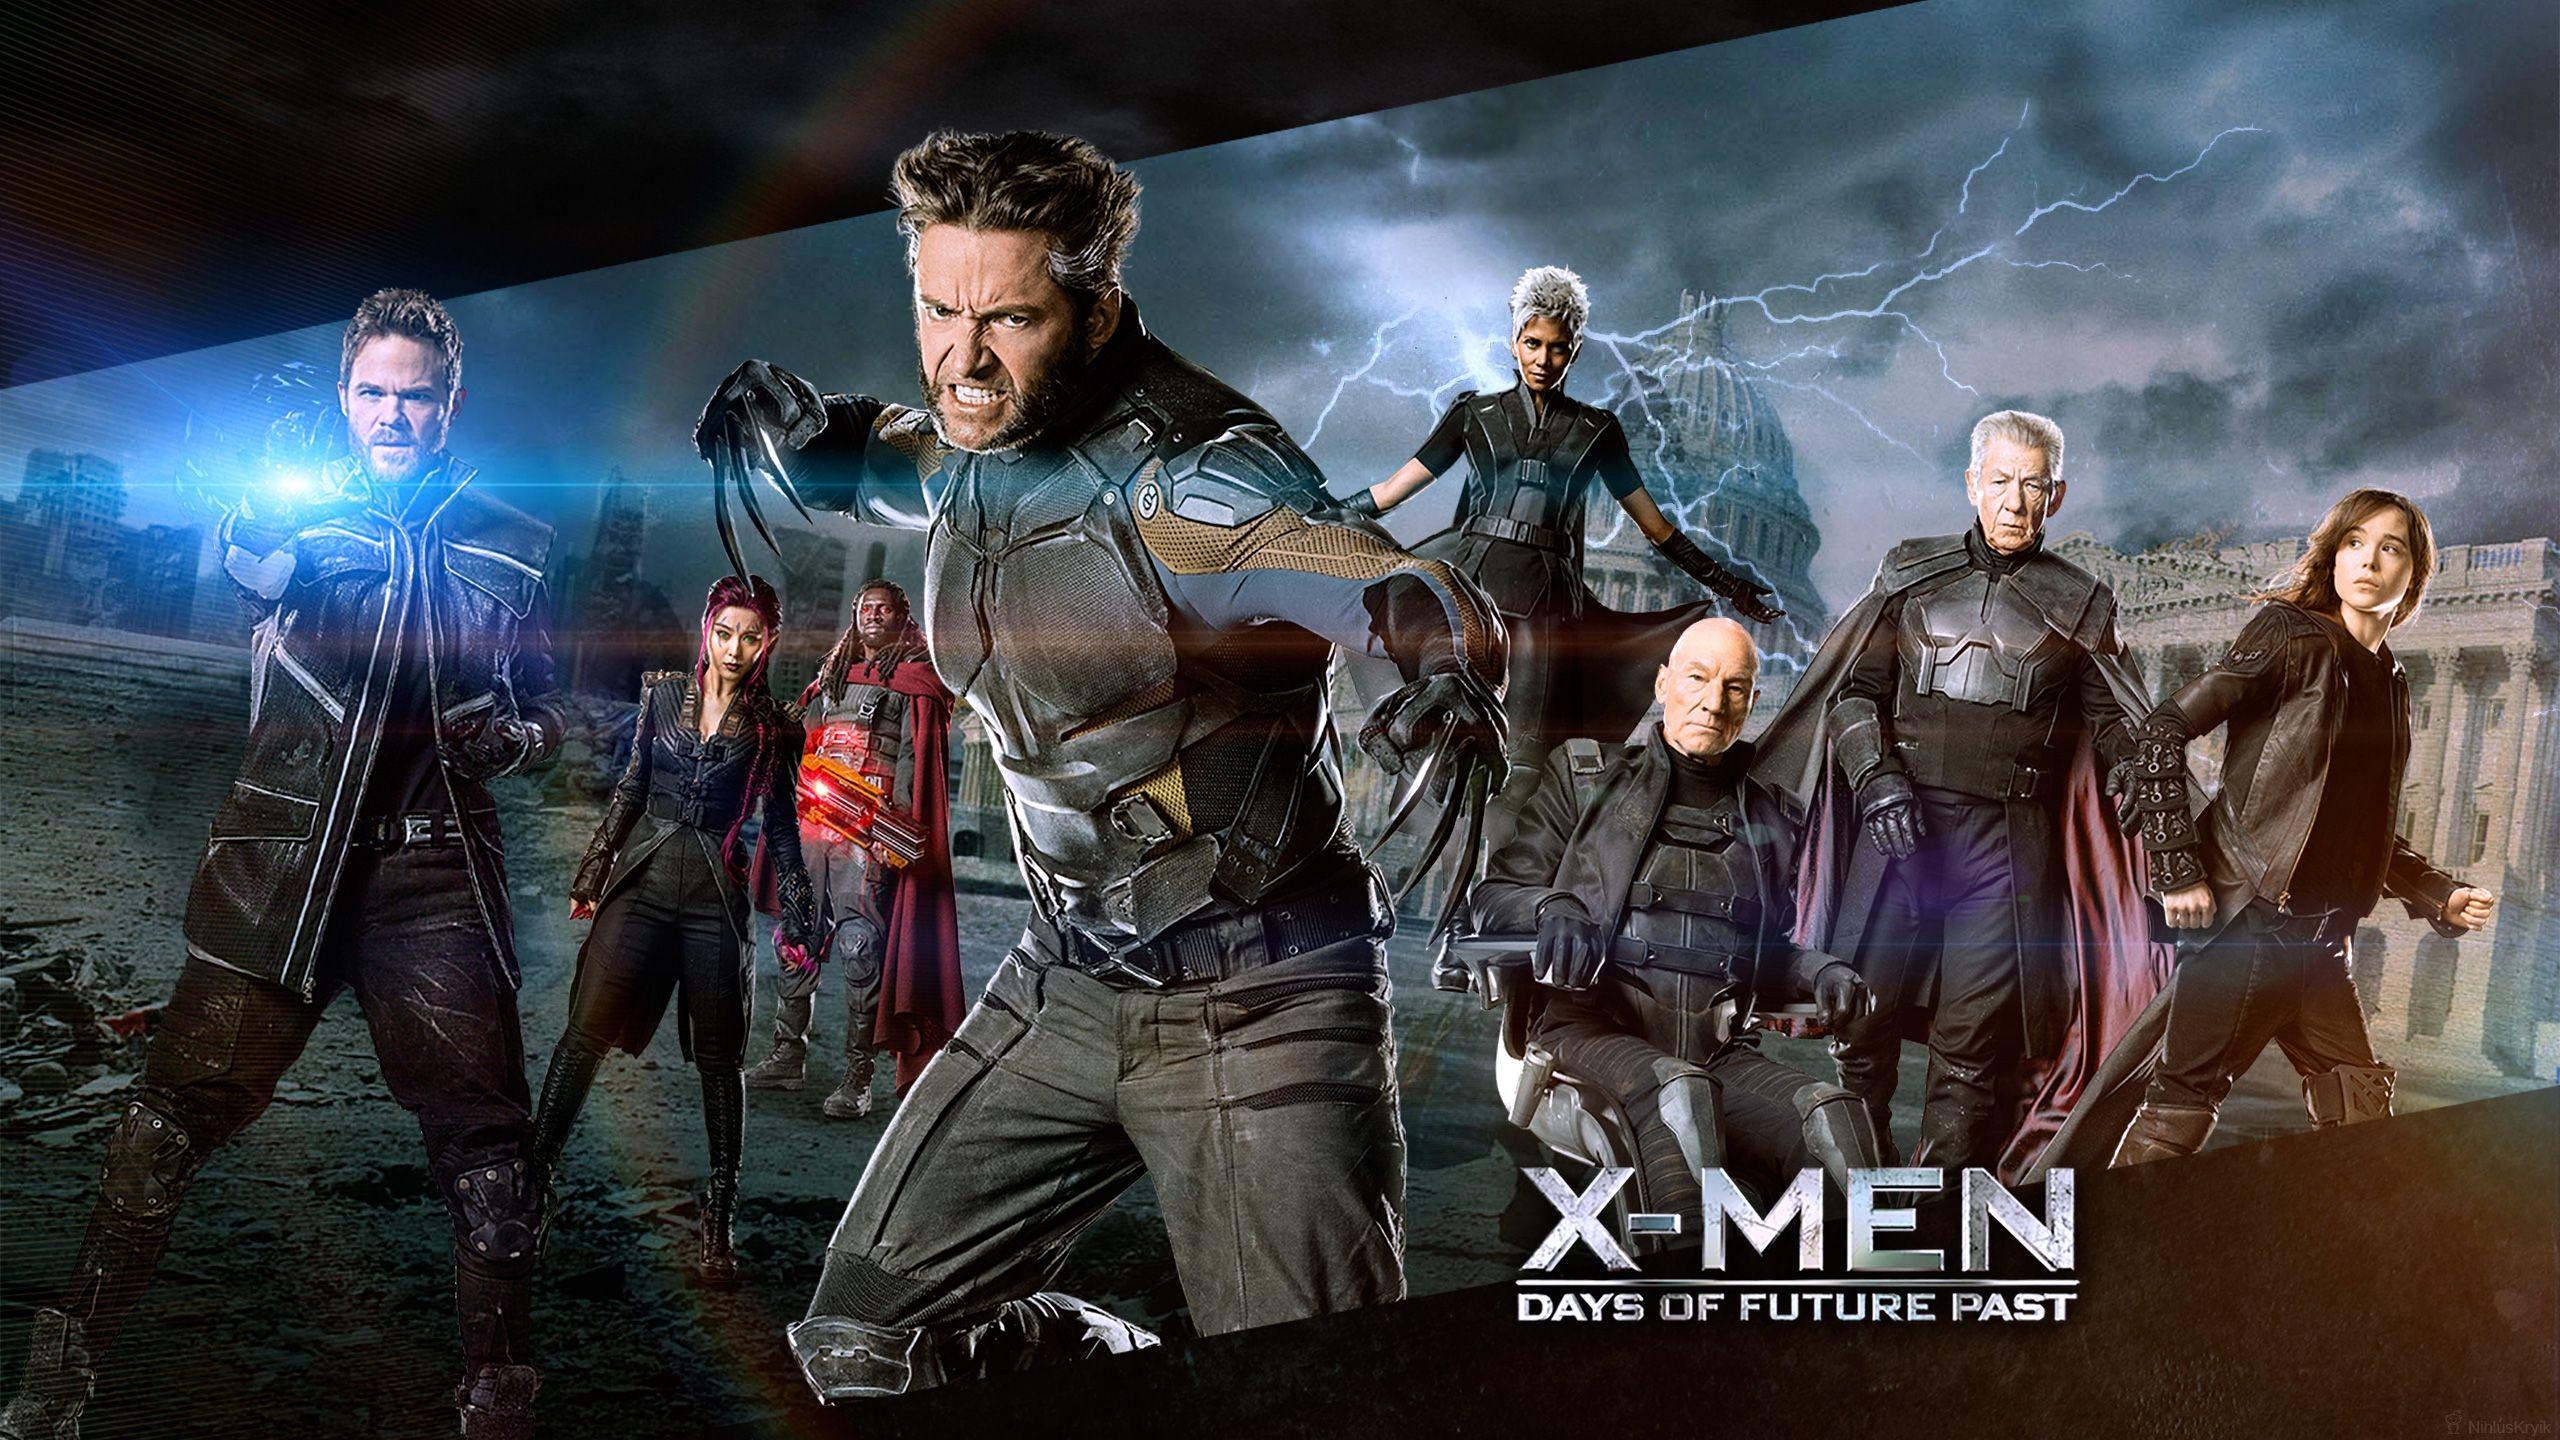 People 2560x1440 X-Men X-Men: Days of Future Past Wolverine Magneto Charles Xavier Beast (character) Ian McKellen science fiction movies Mystique Marvel Comics Patrick Stewart Storm (character) Hugh Jackman Kitty Pryde